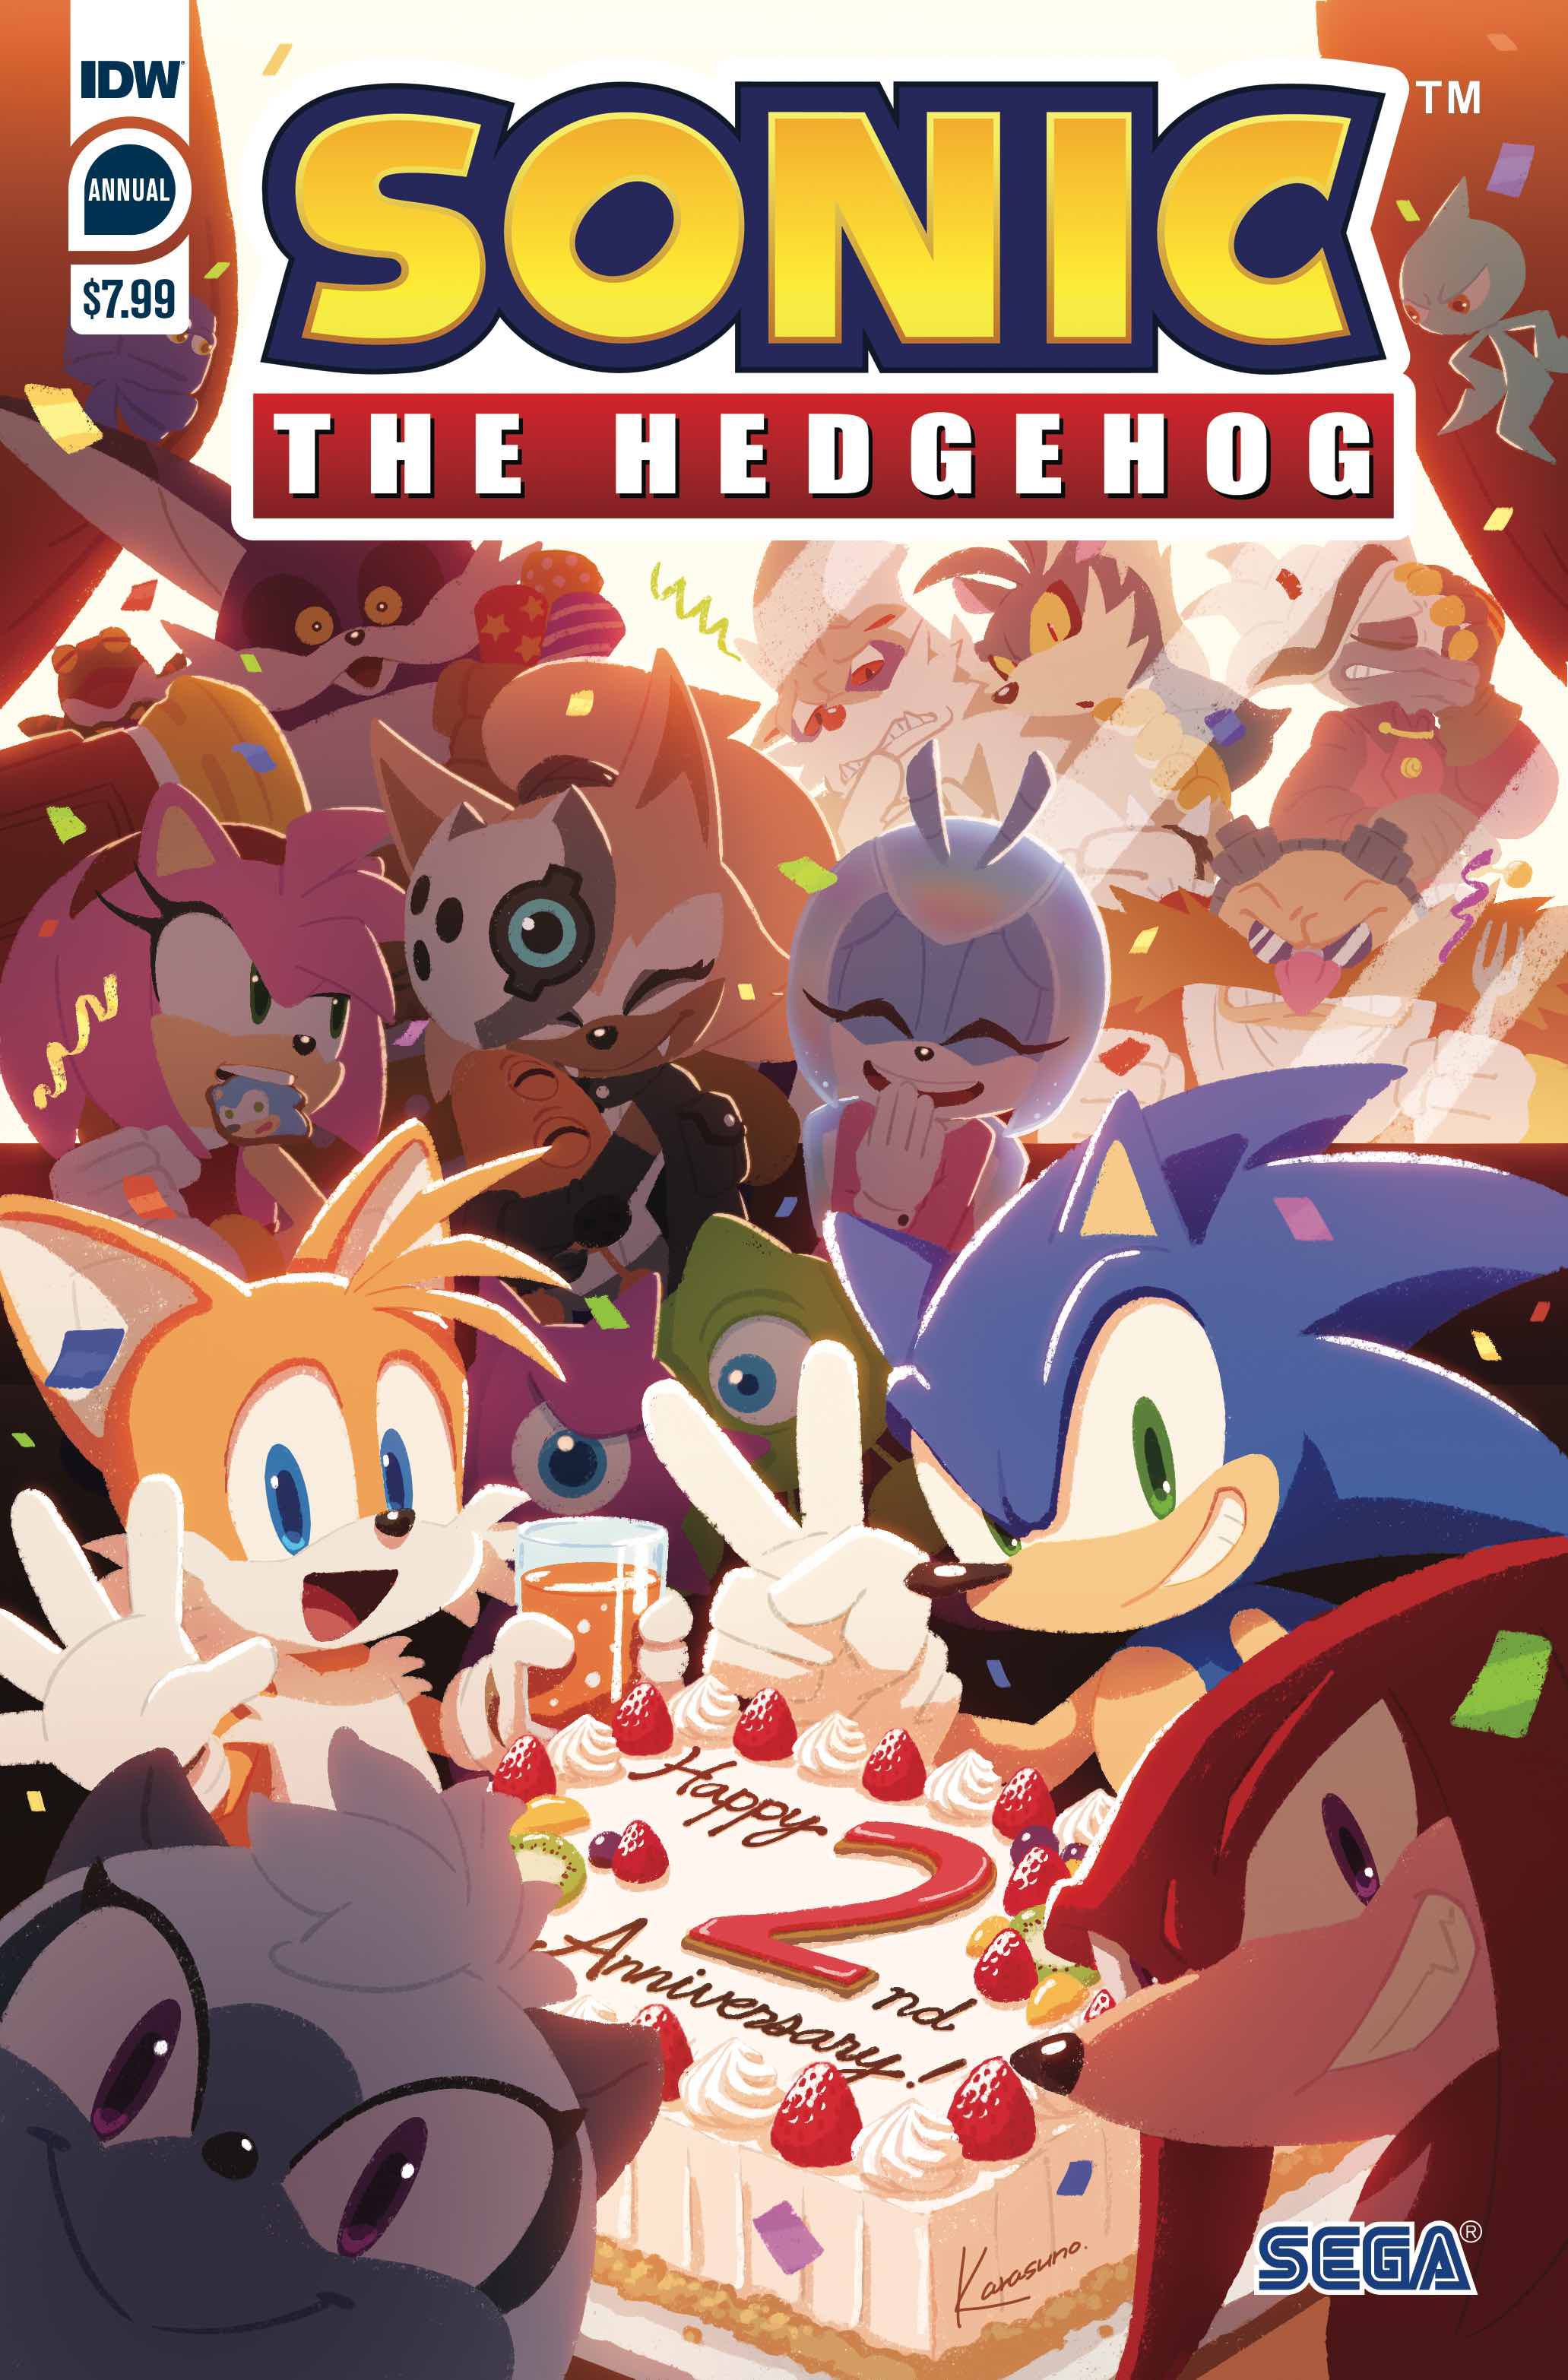 SONIC THE HEDGEHOG #16 GRAY VARIANT IDW COMICS VIDEO GAME SEGA